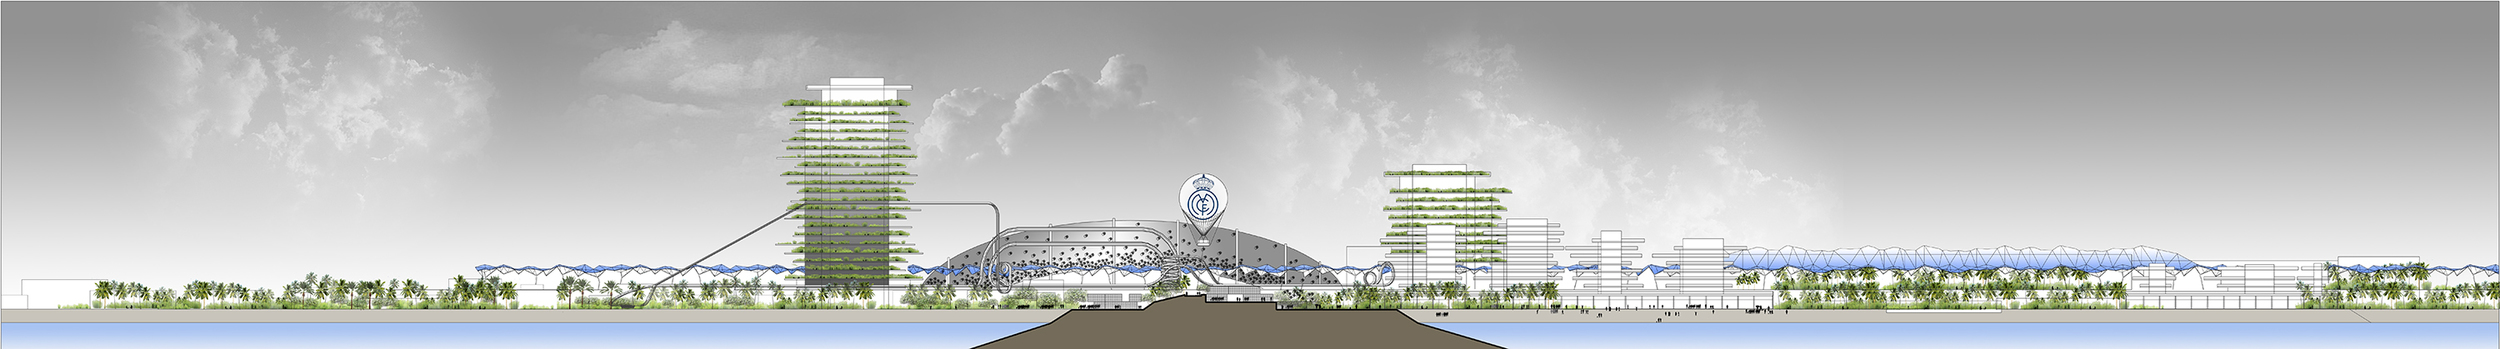 BOIFFILS-Real Madrid Resort Island-Section-01.jpg